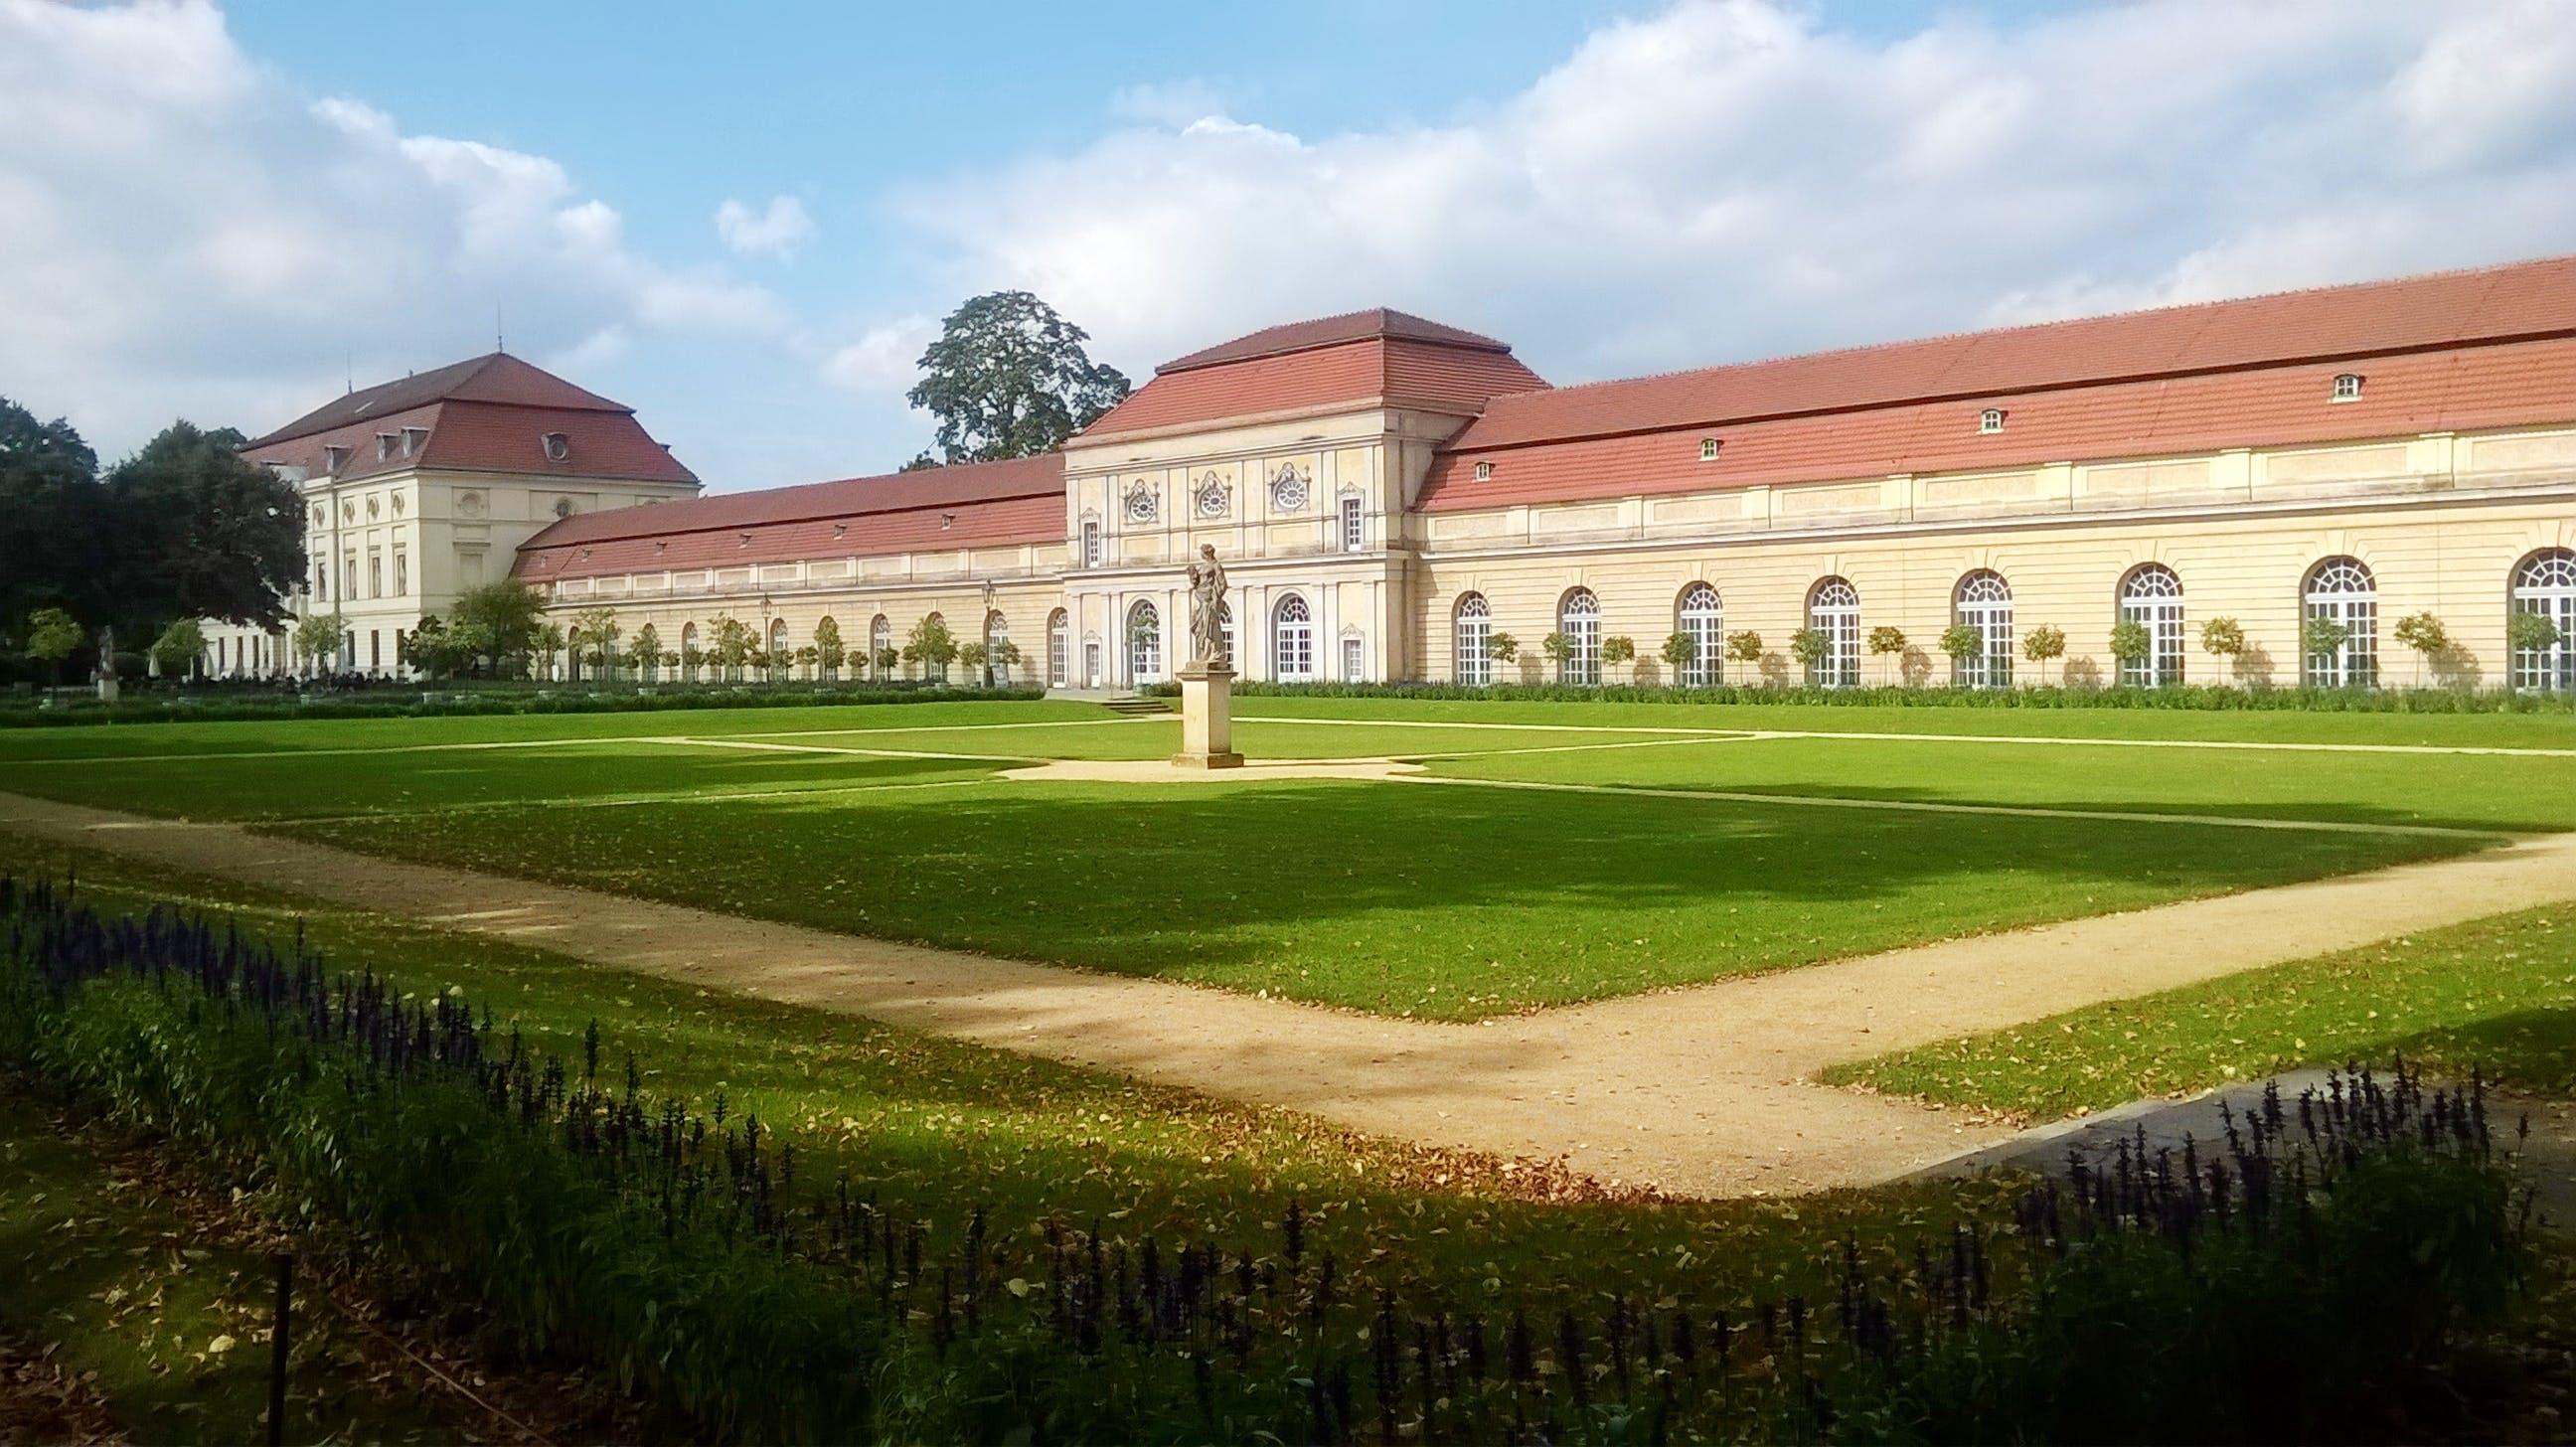 berlin, castle, Charlottenburg Palace